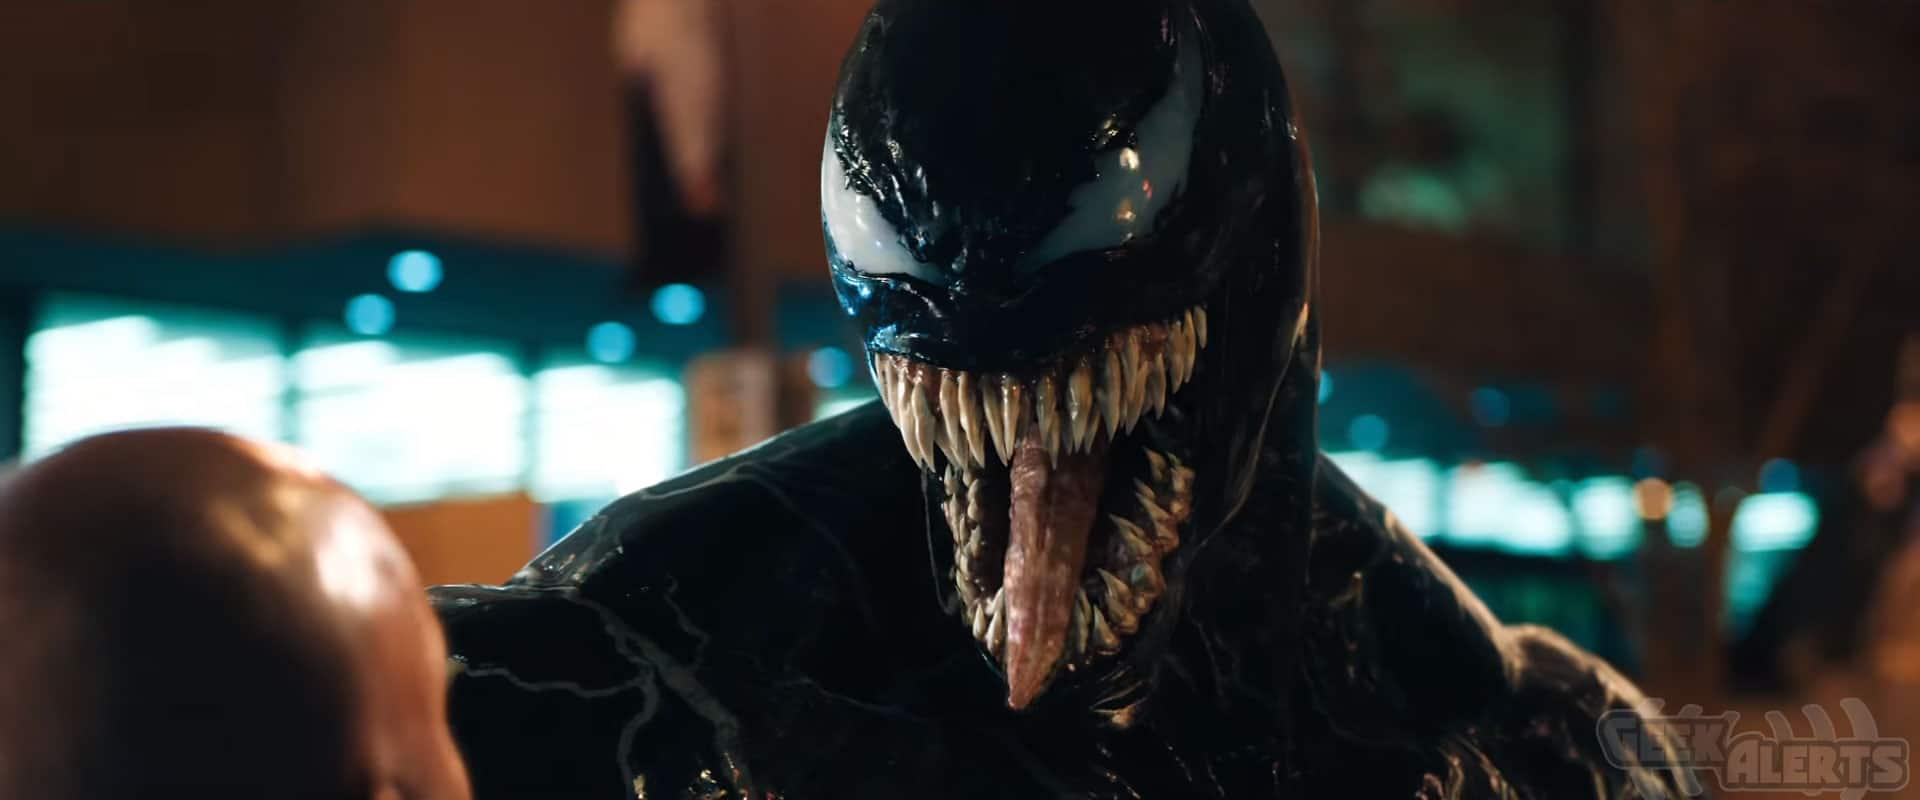 venom Full Movie Download